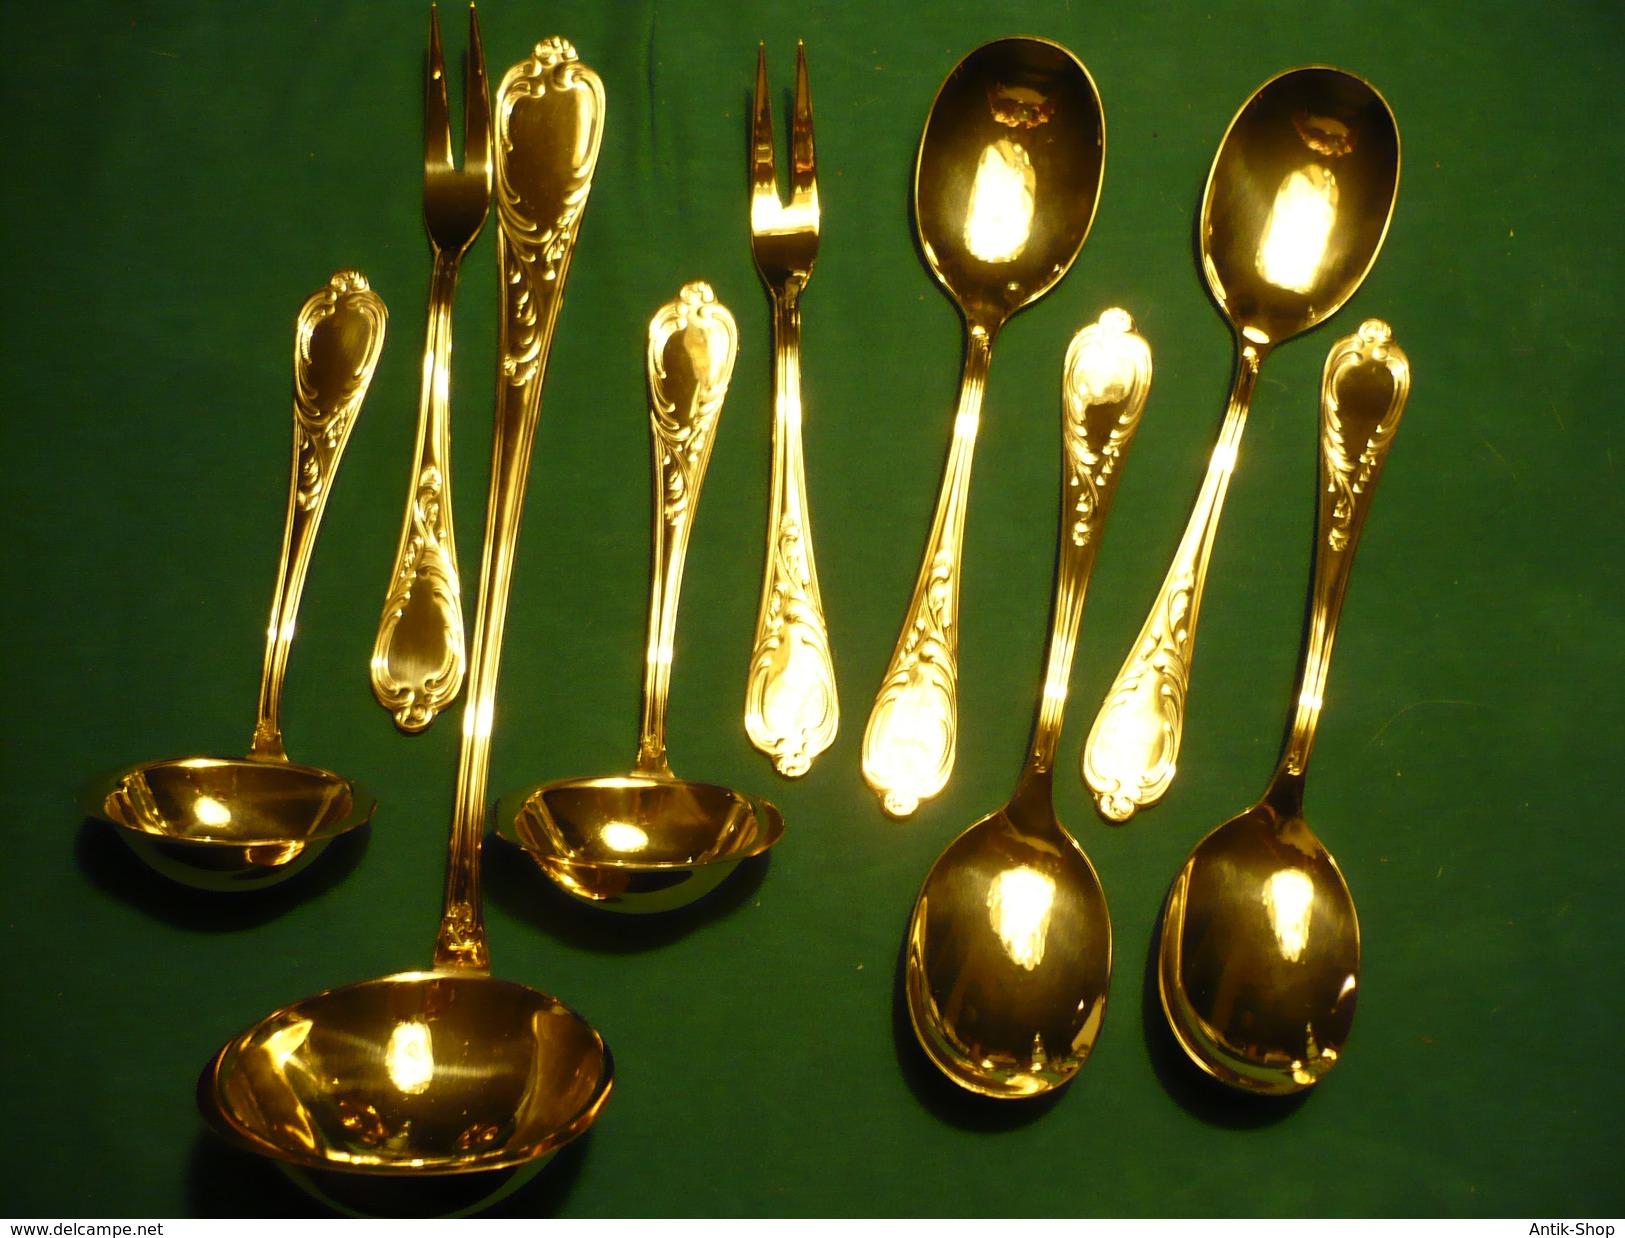 9 Teile Besteck Hart Vergoldet  (358) - Knives